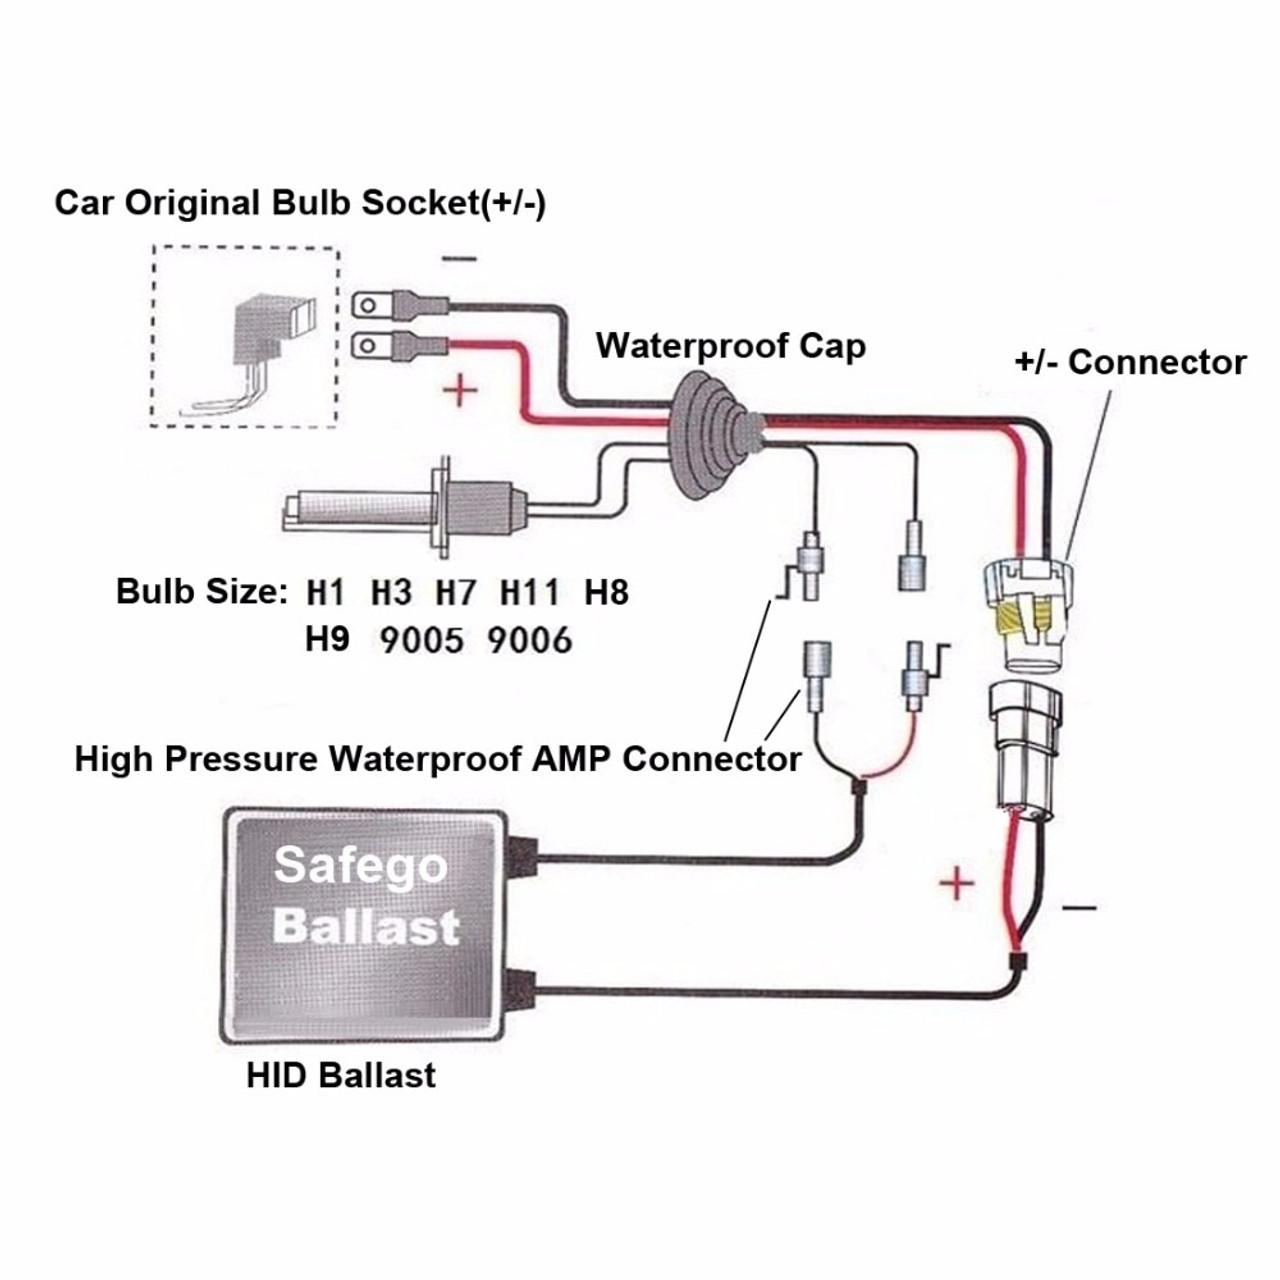 small resolution of slim ballast hid kit xenon 35w h4 h7 h11 xenon hid conversion kit h1 corolla diy diy non hid 9005 9006 to h4 conversion diagram